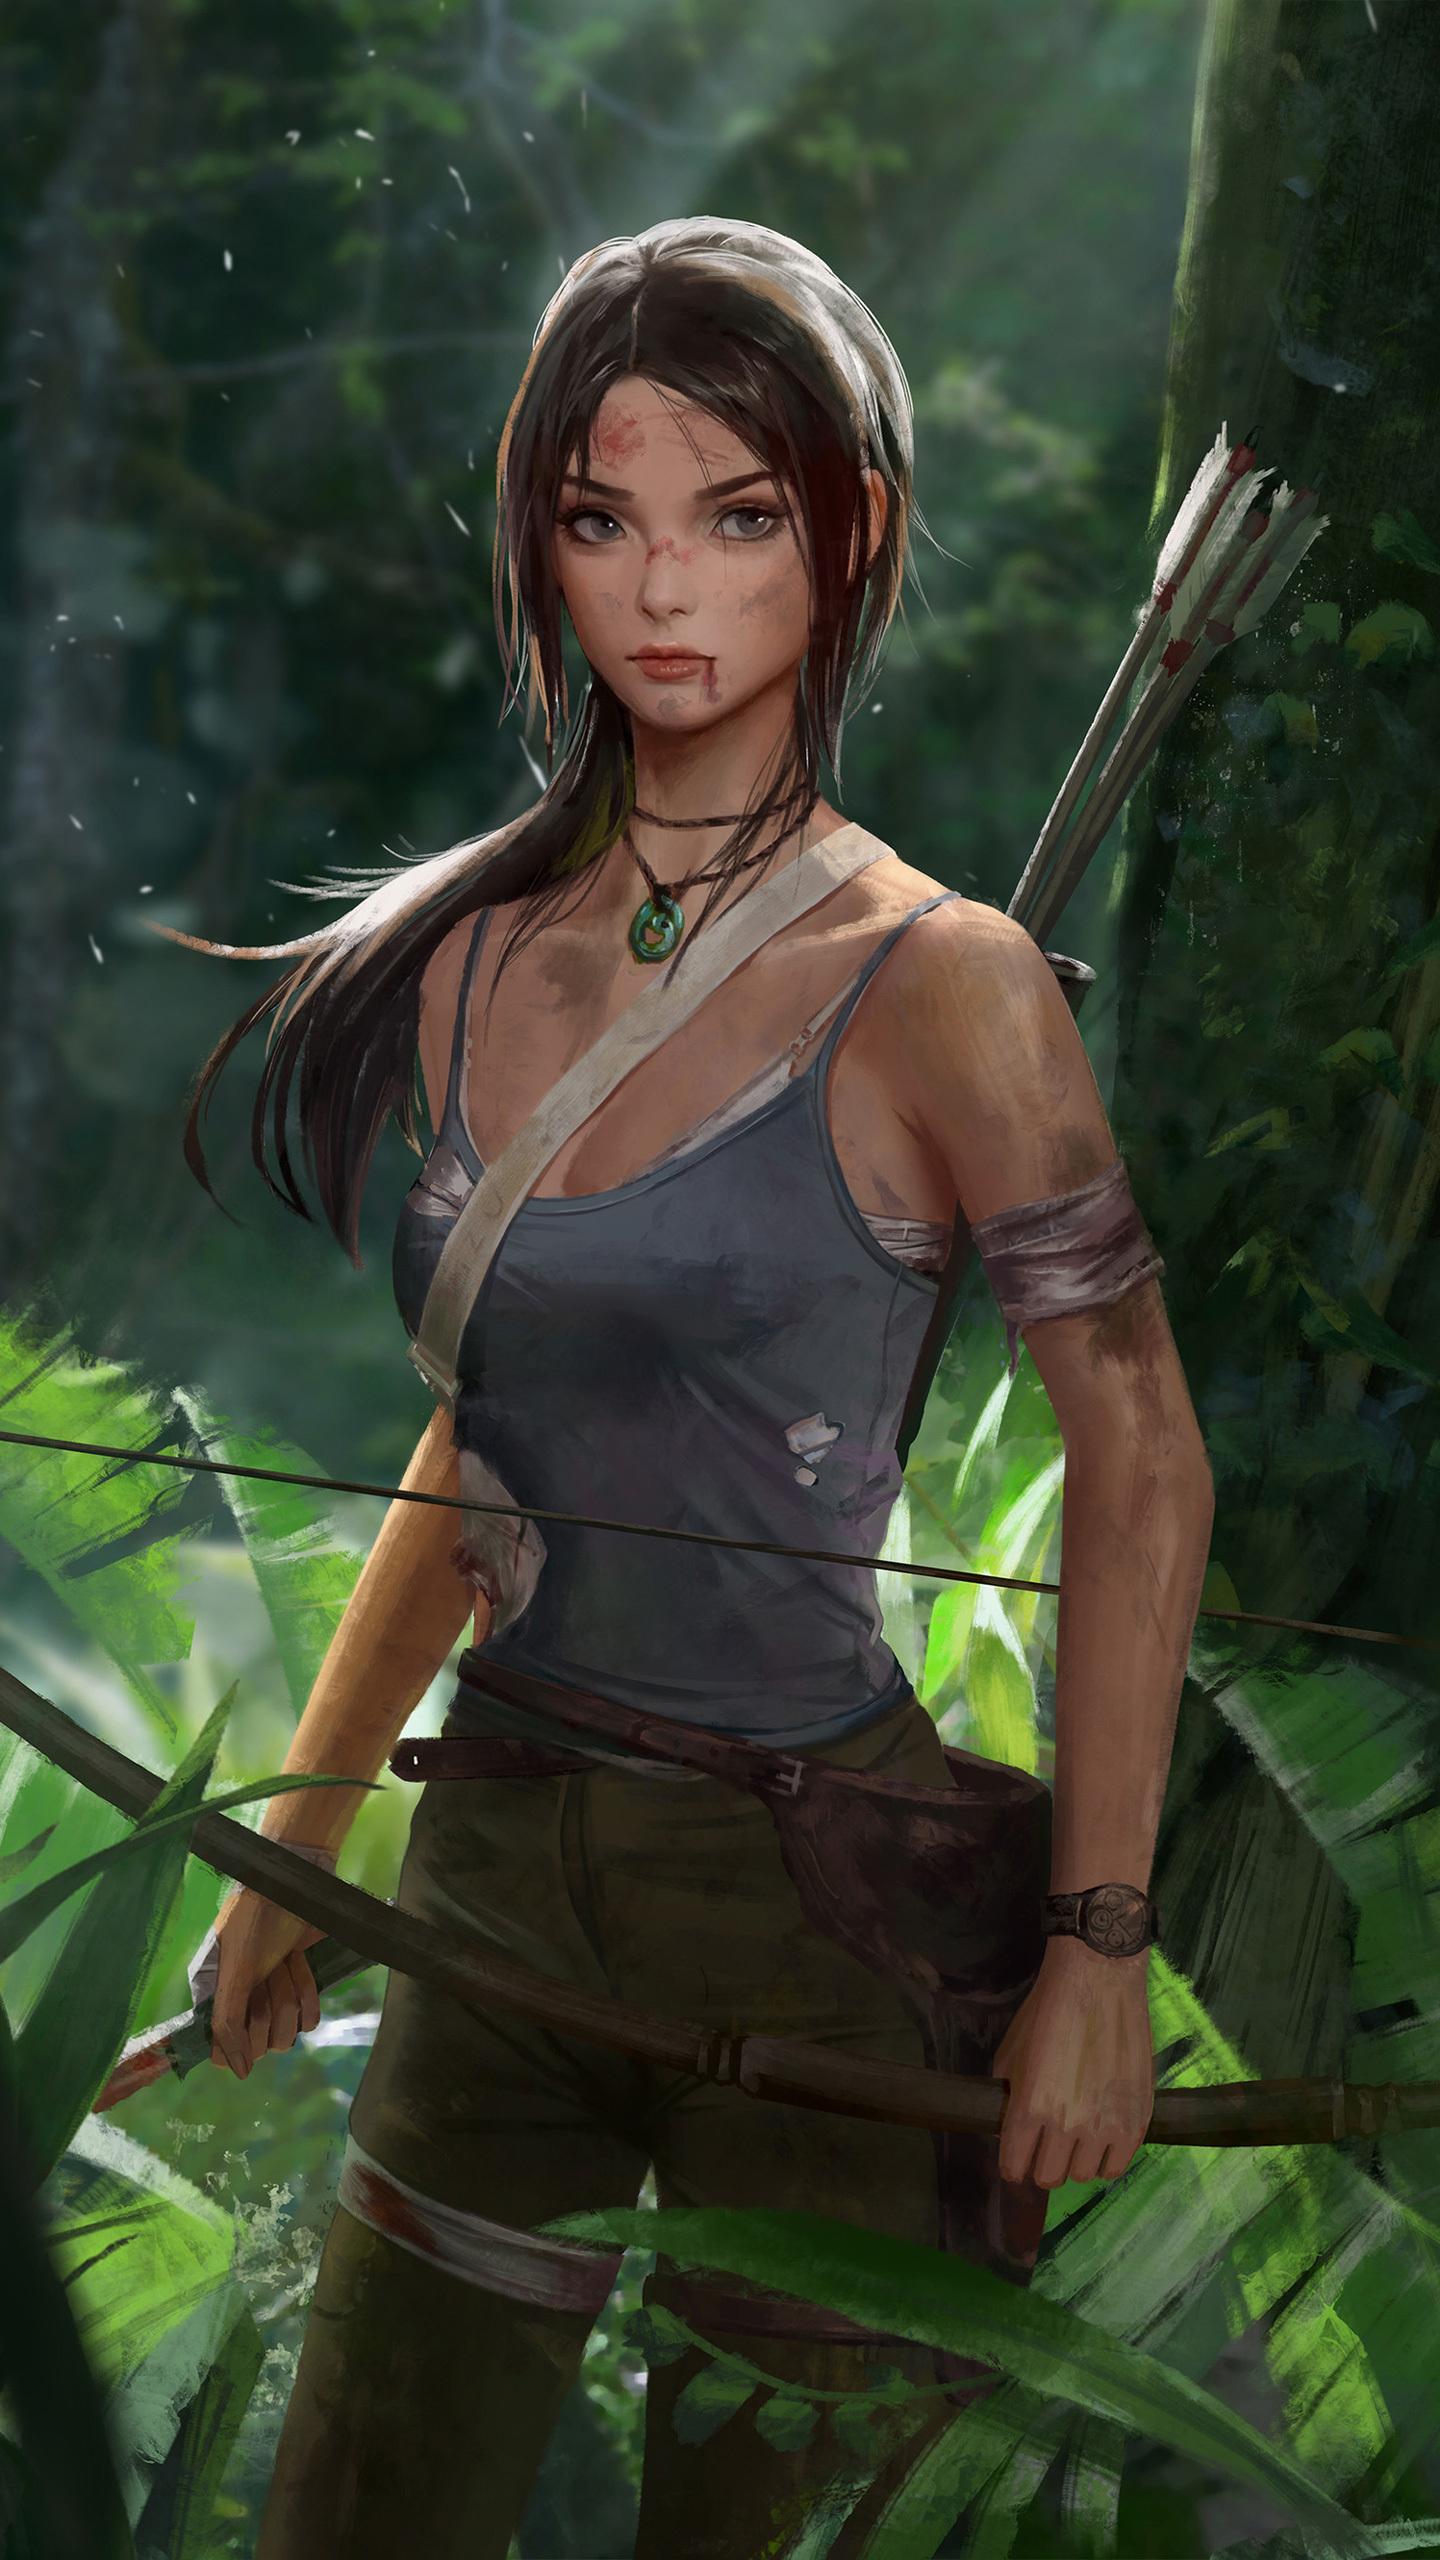 1440x2560 Tomb Raider Lara Croft Artwork Samsung Galaxy S6